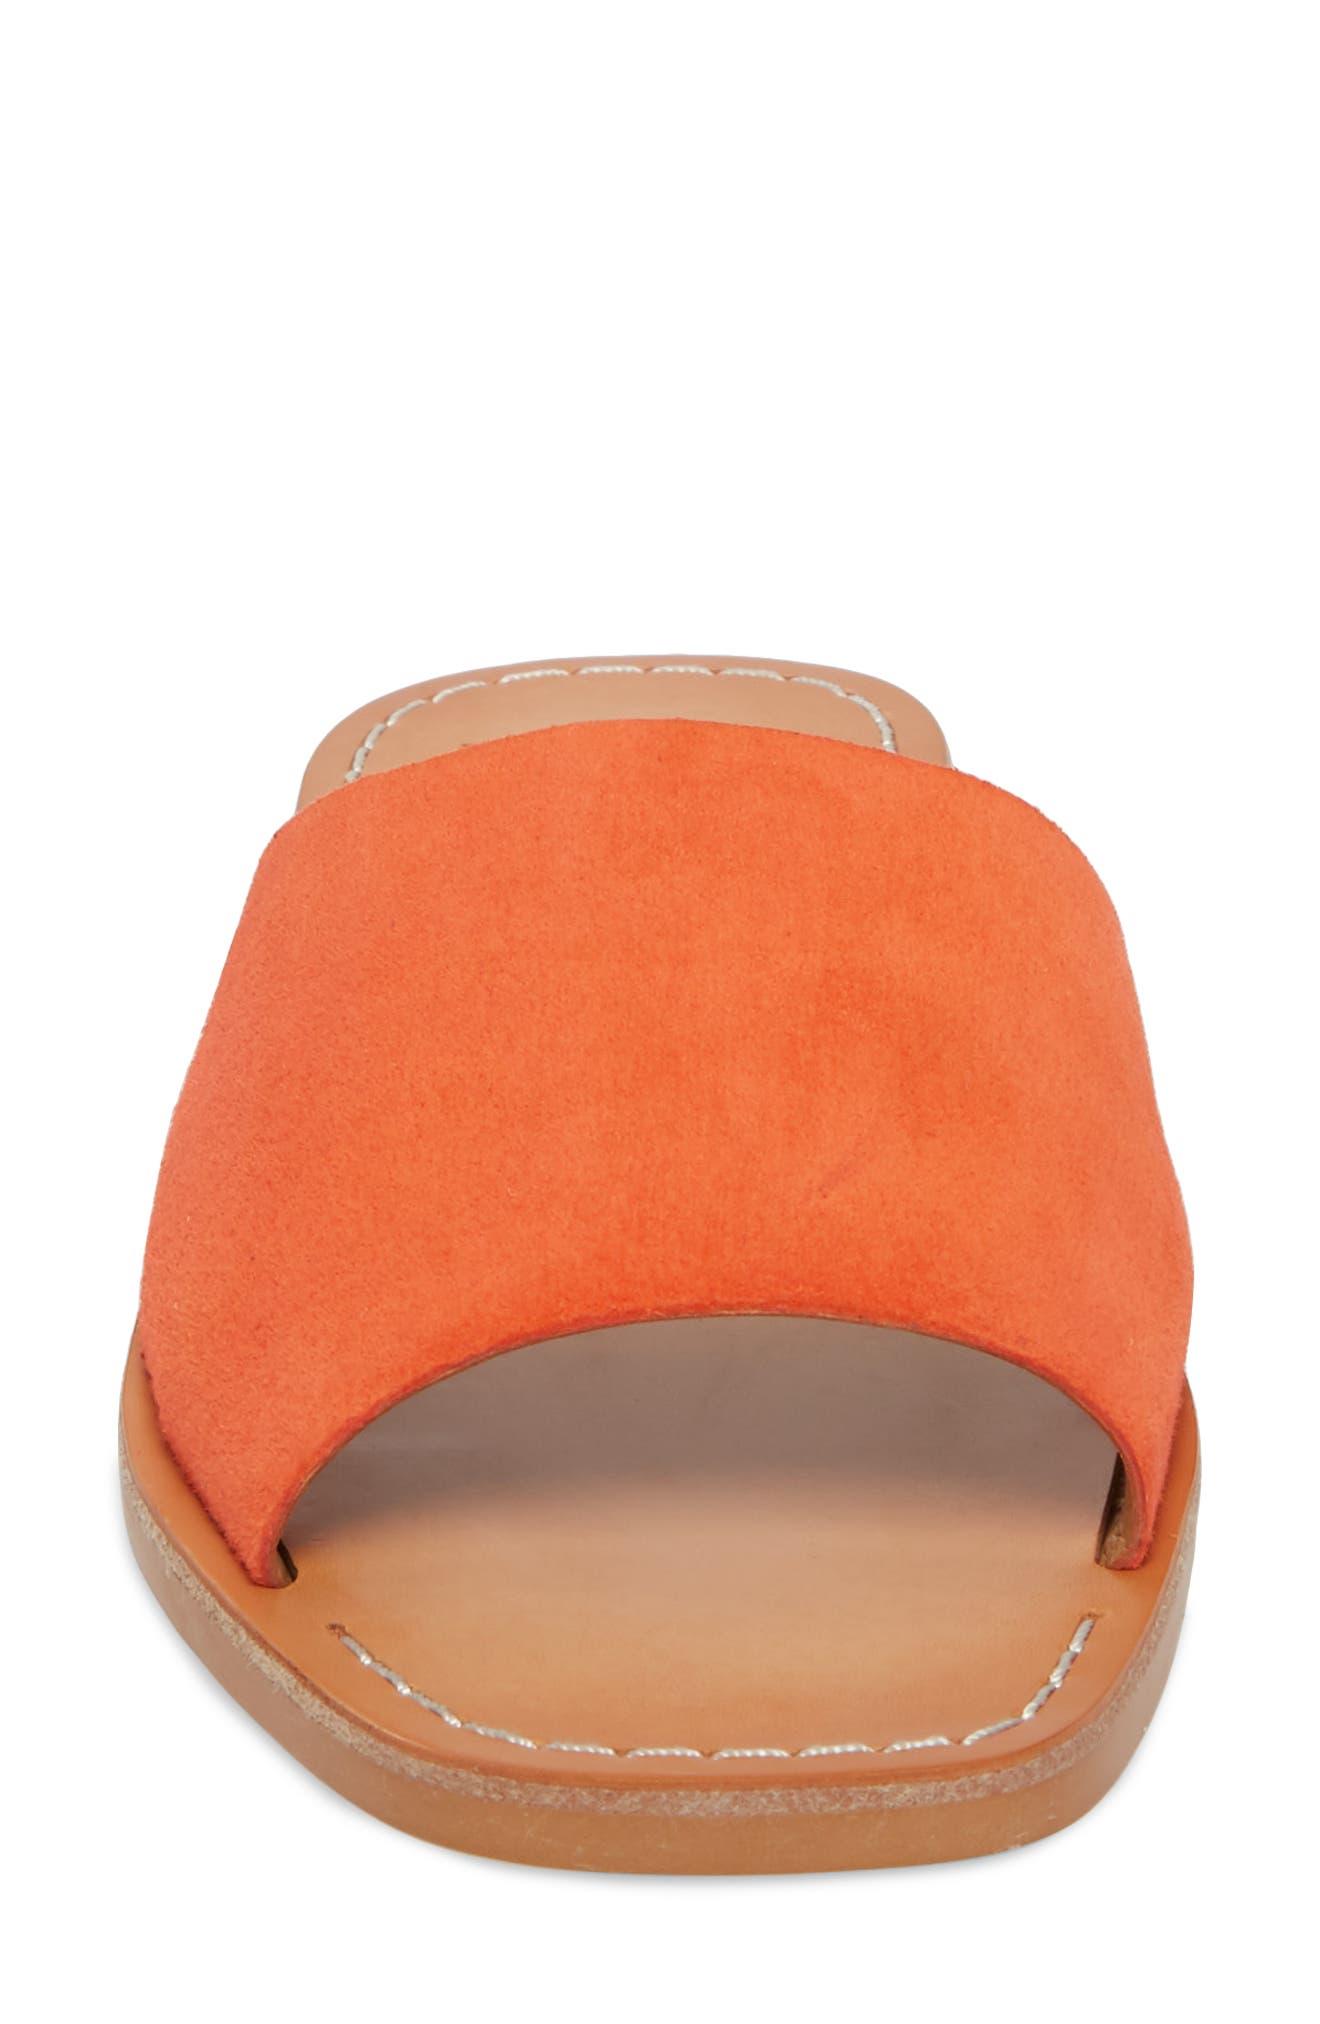 Cato Asymmetrical Slide Sandal,                             Alternate thumbnail 4, color,                             Orange Suede